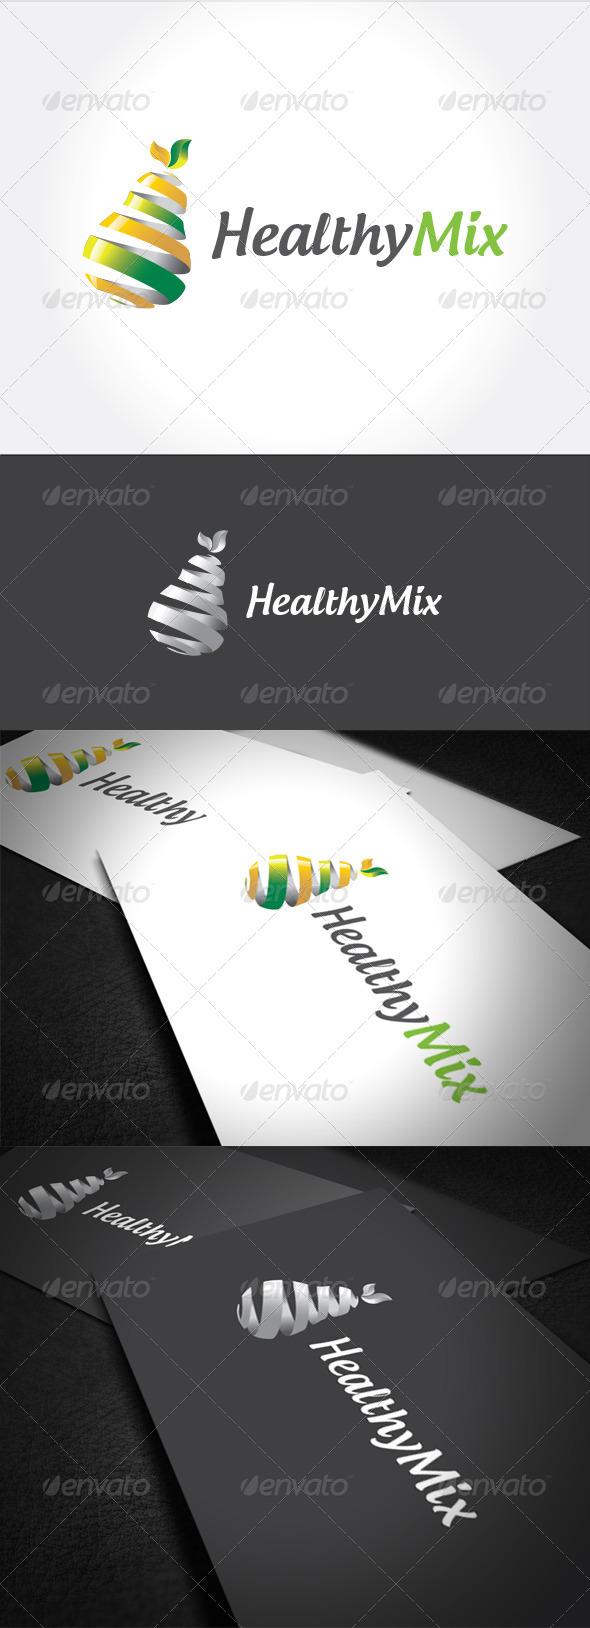 Healty Mix Logo Template